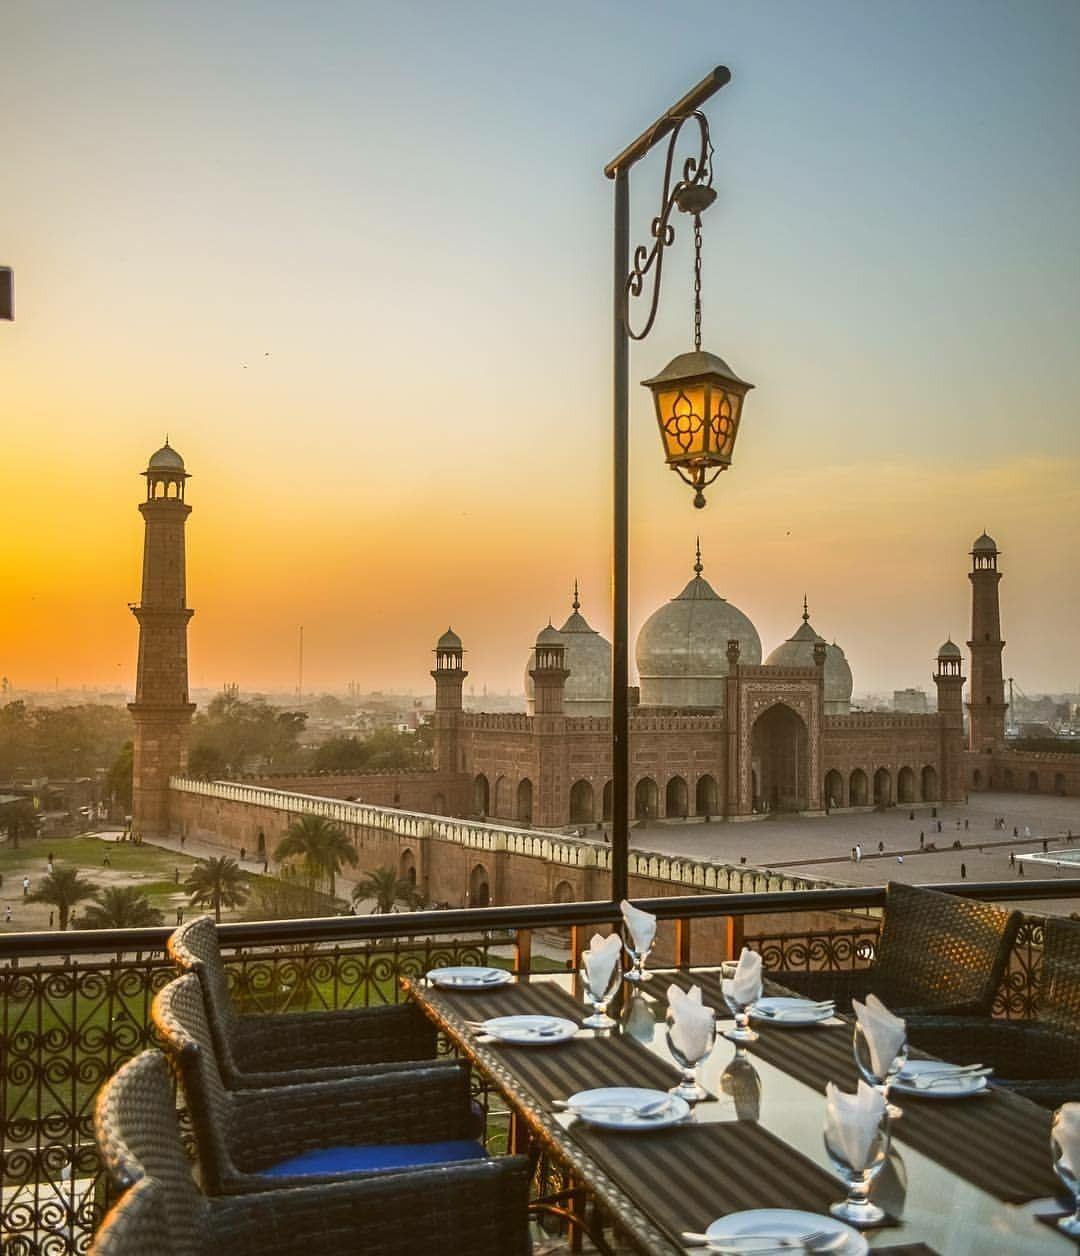 Lahore Pakistan Digitalmarketing Pakistan Socialmediamarketing Digitalmarketingpakistan Digitalagency Karachi L Lahore Pakistan Pakistan Pakistan Travel